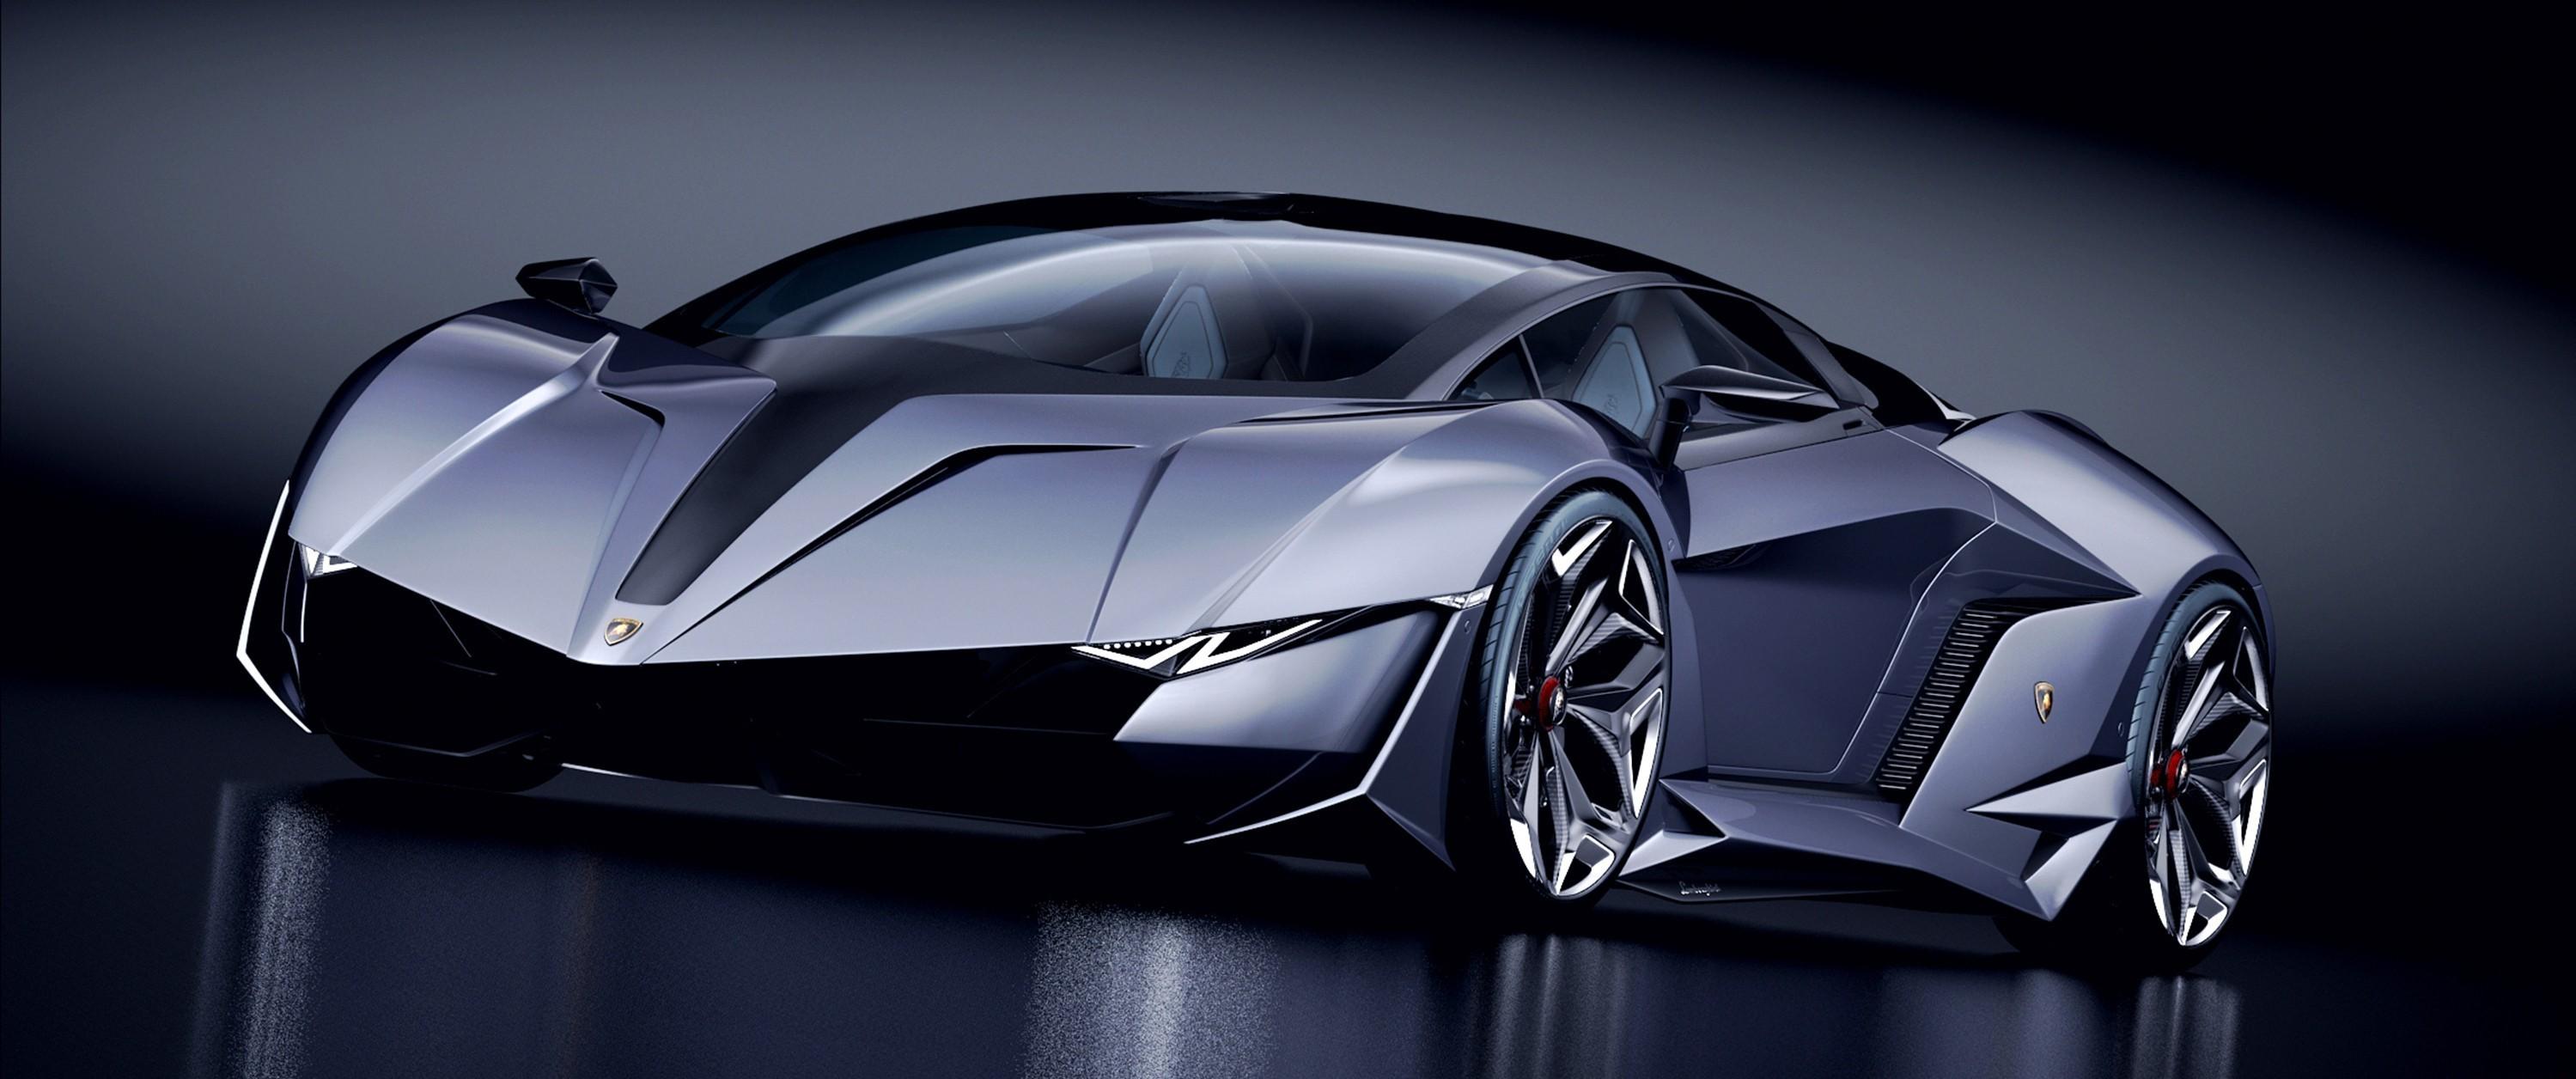 Wallpaper Concept Cars Sports Car Performance Car Lamborghini